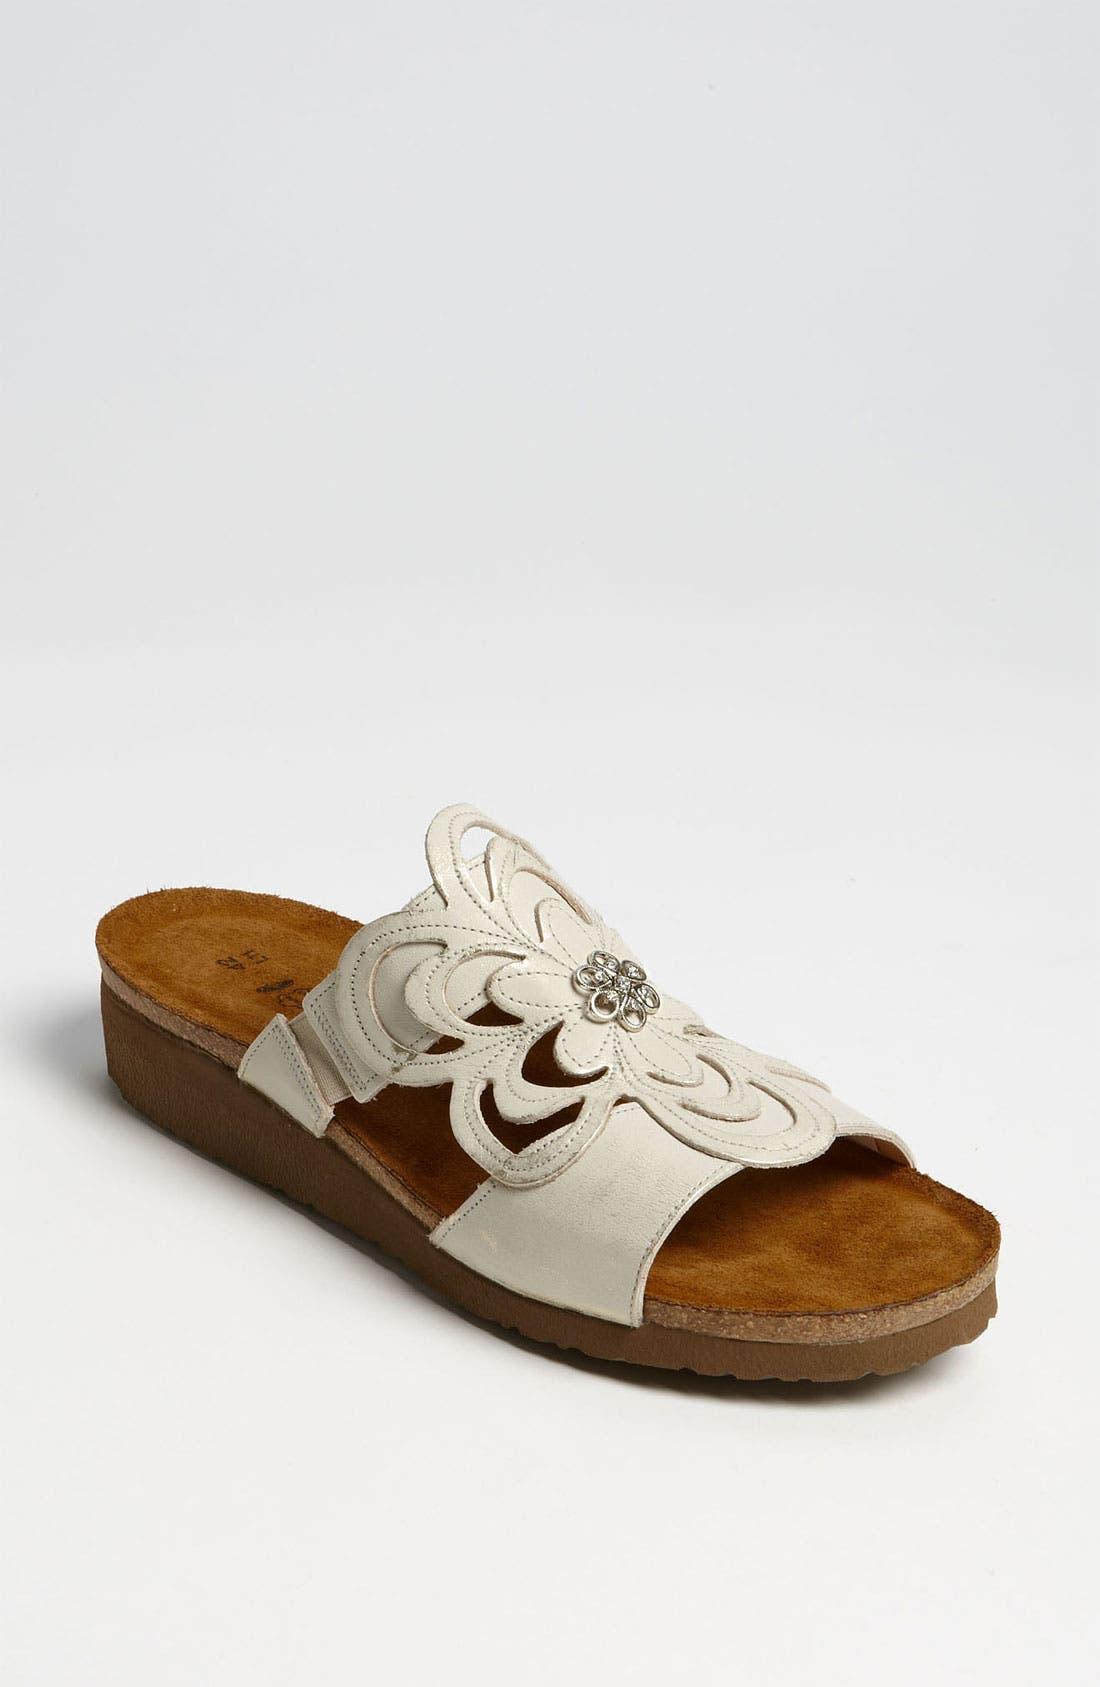 Alternate Image 1 Selected - Naot 'Sandy' Sandal